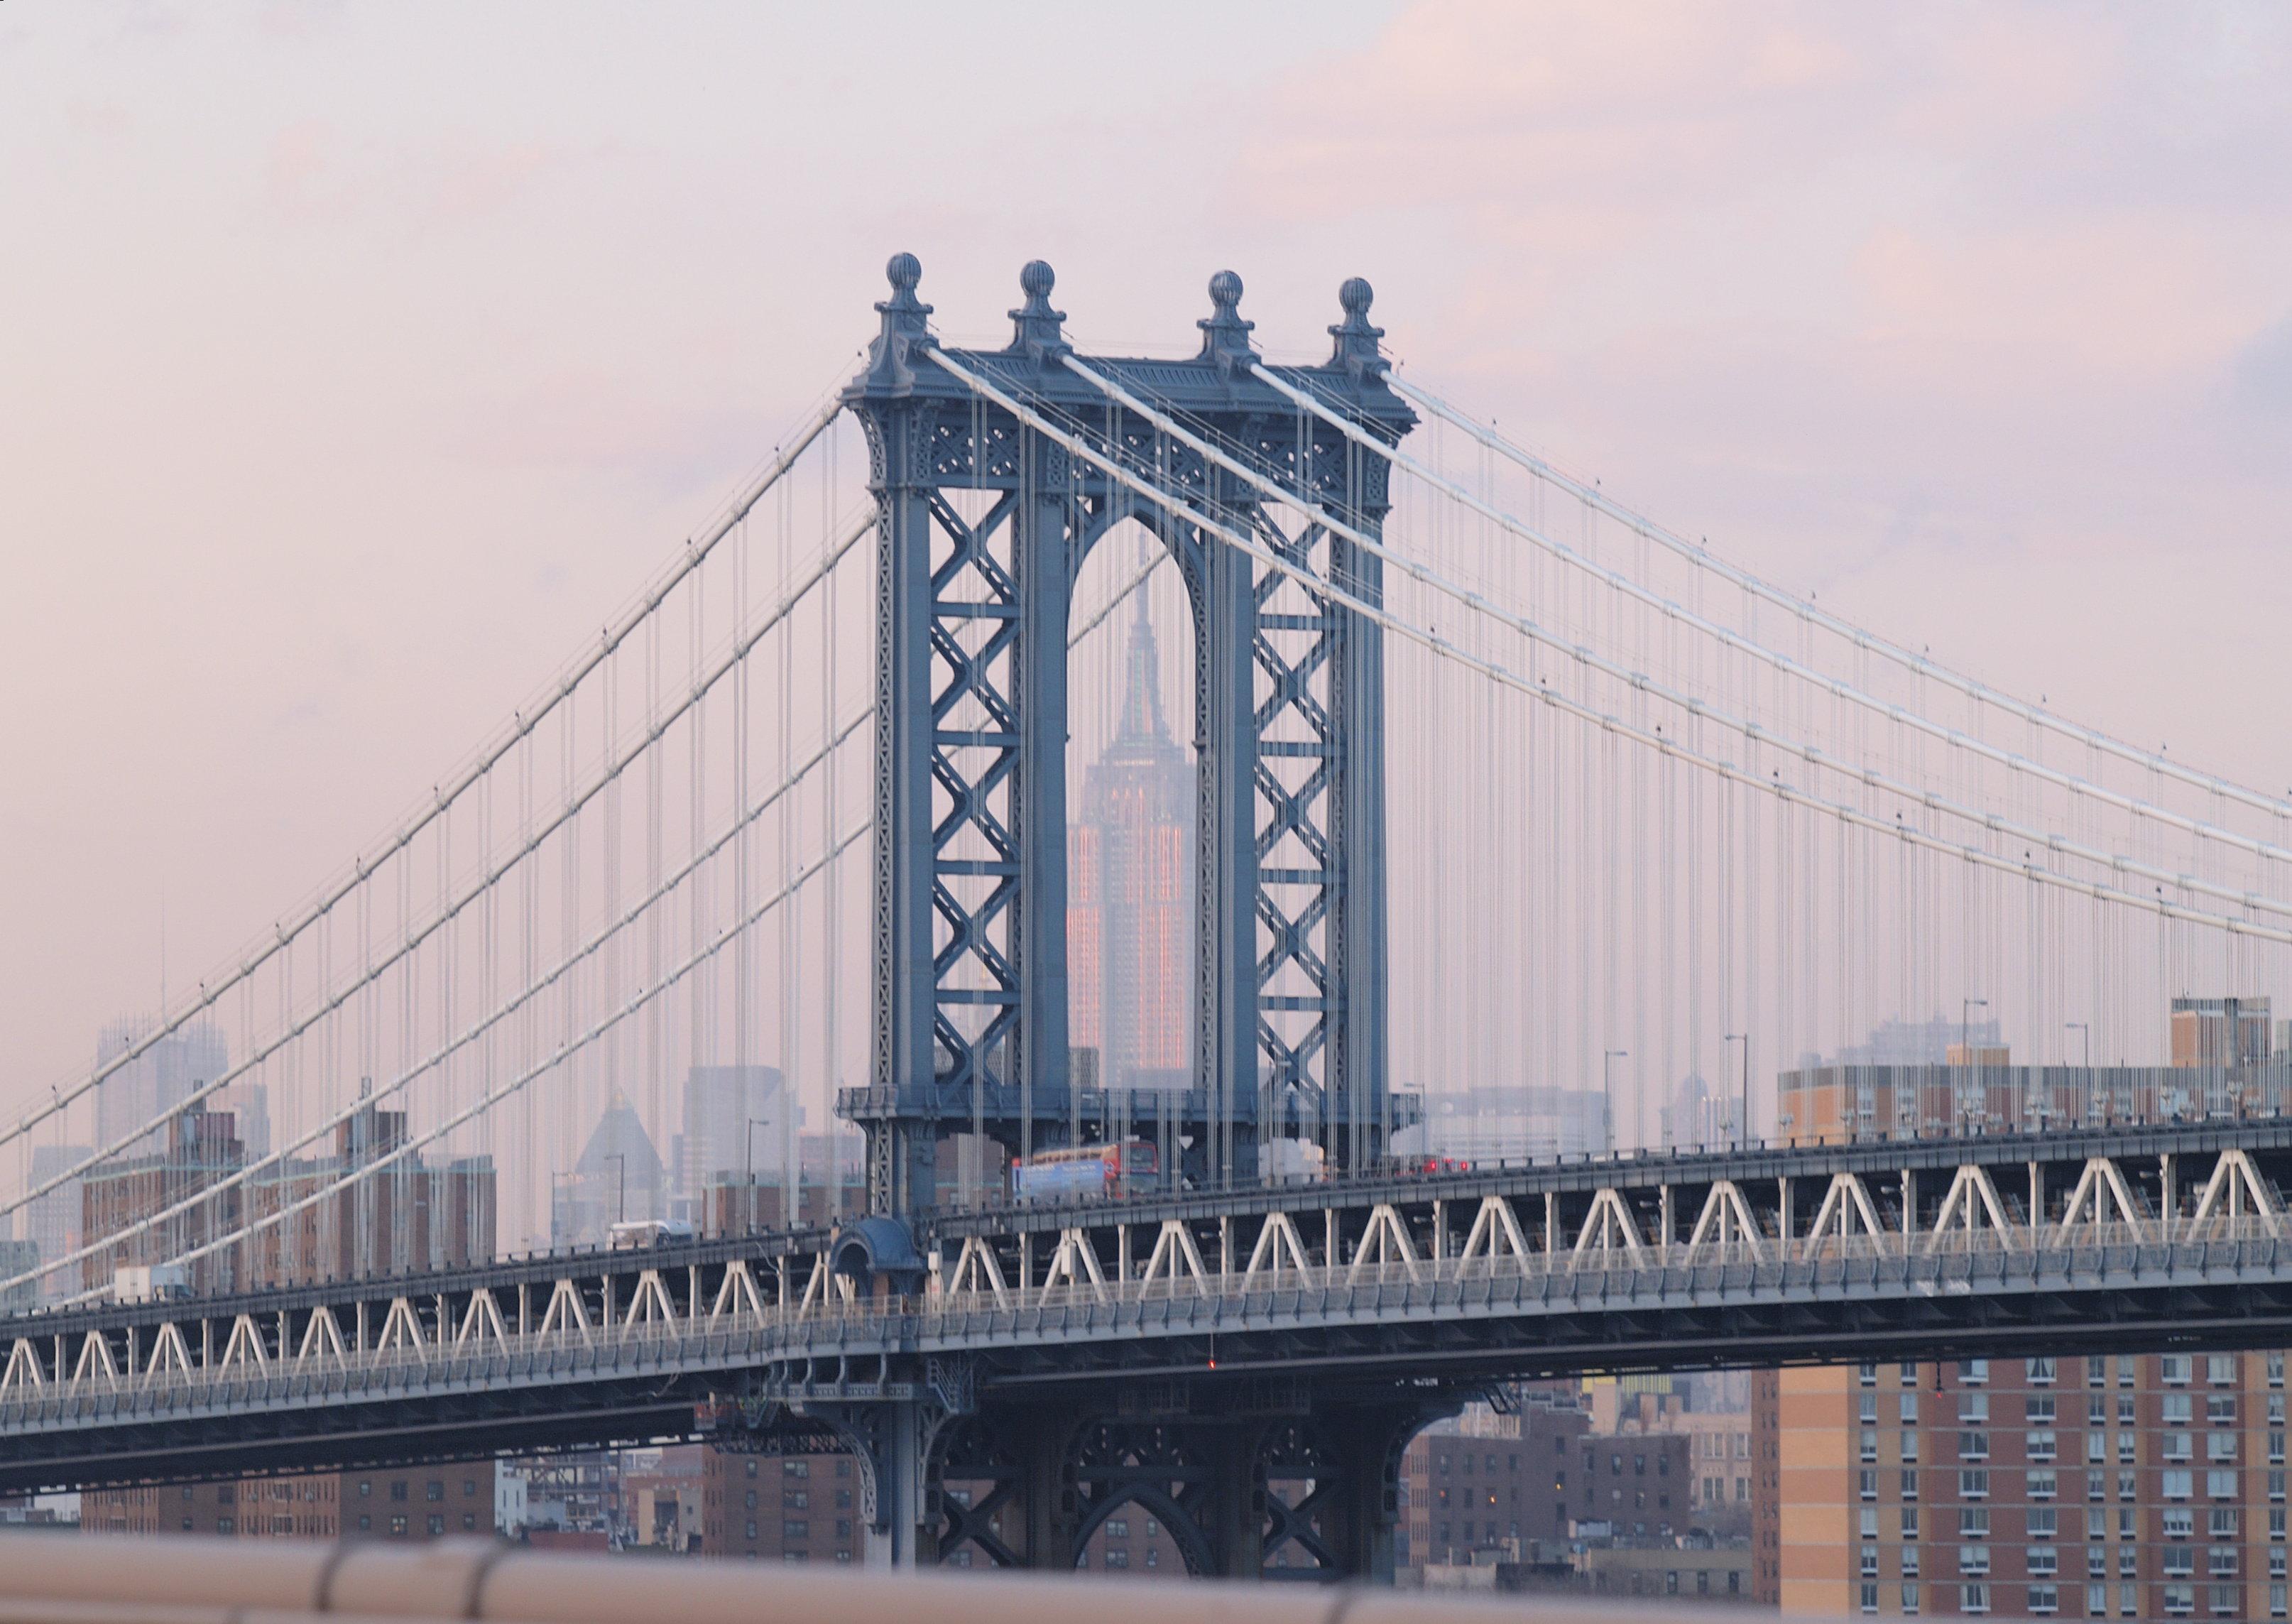 Hd New York City Background